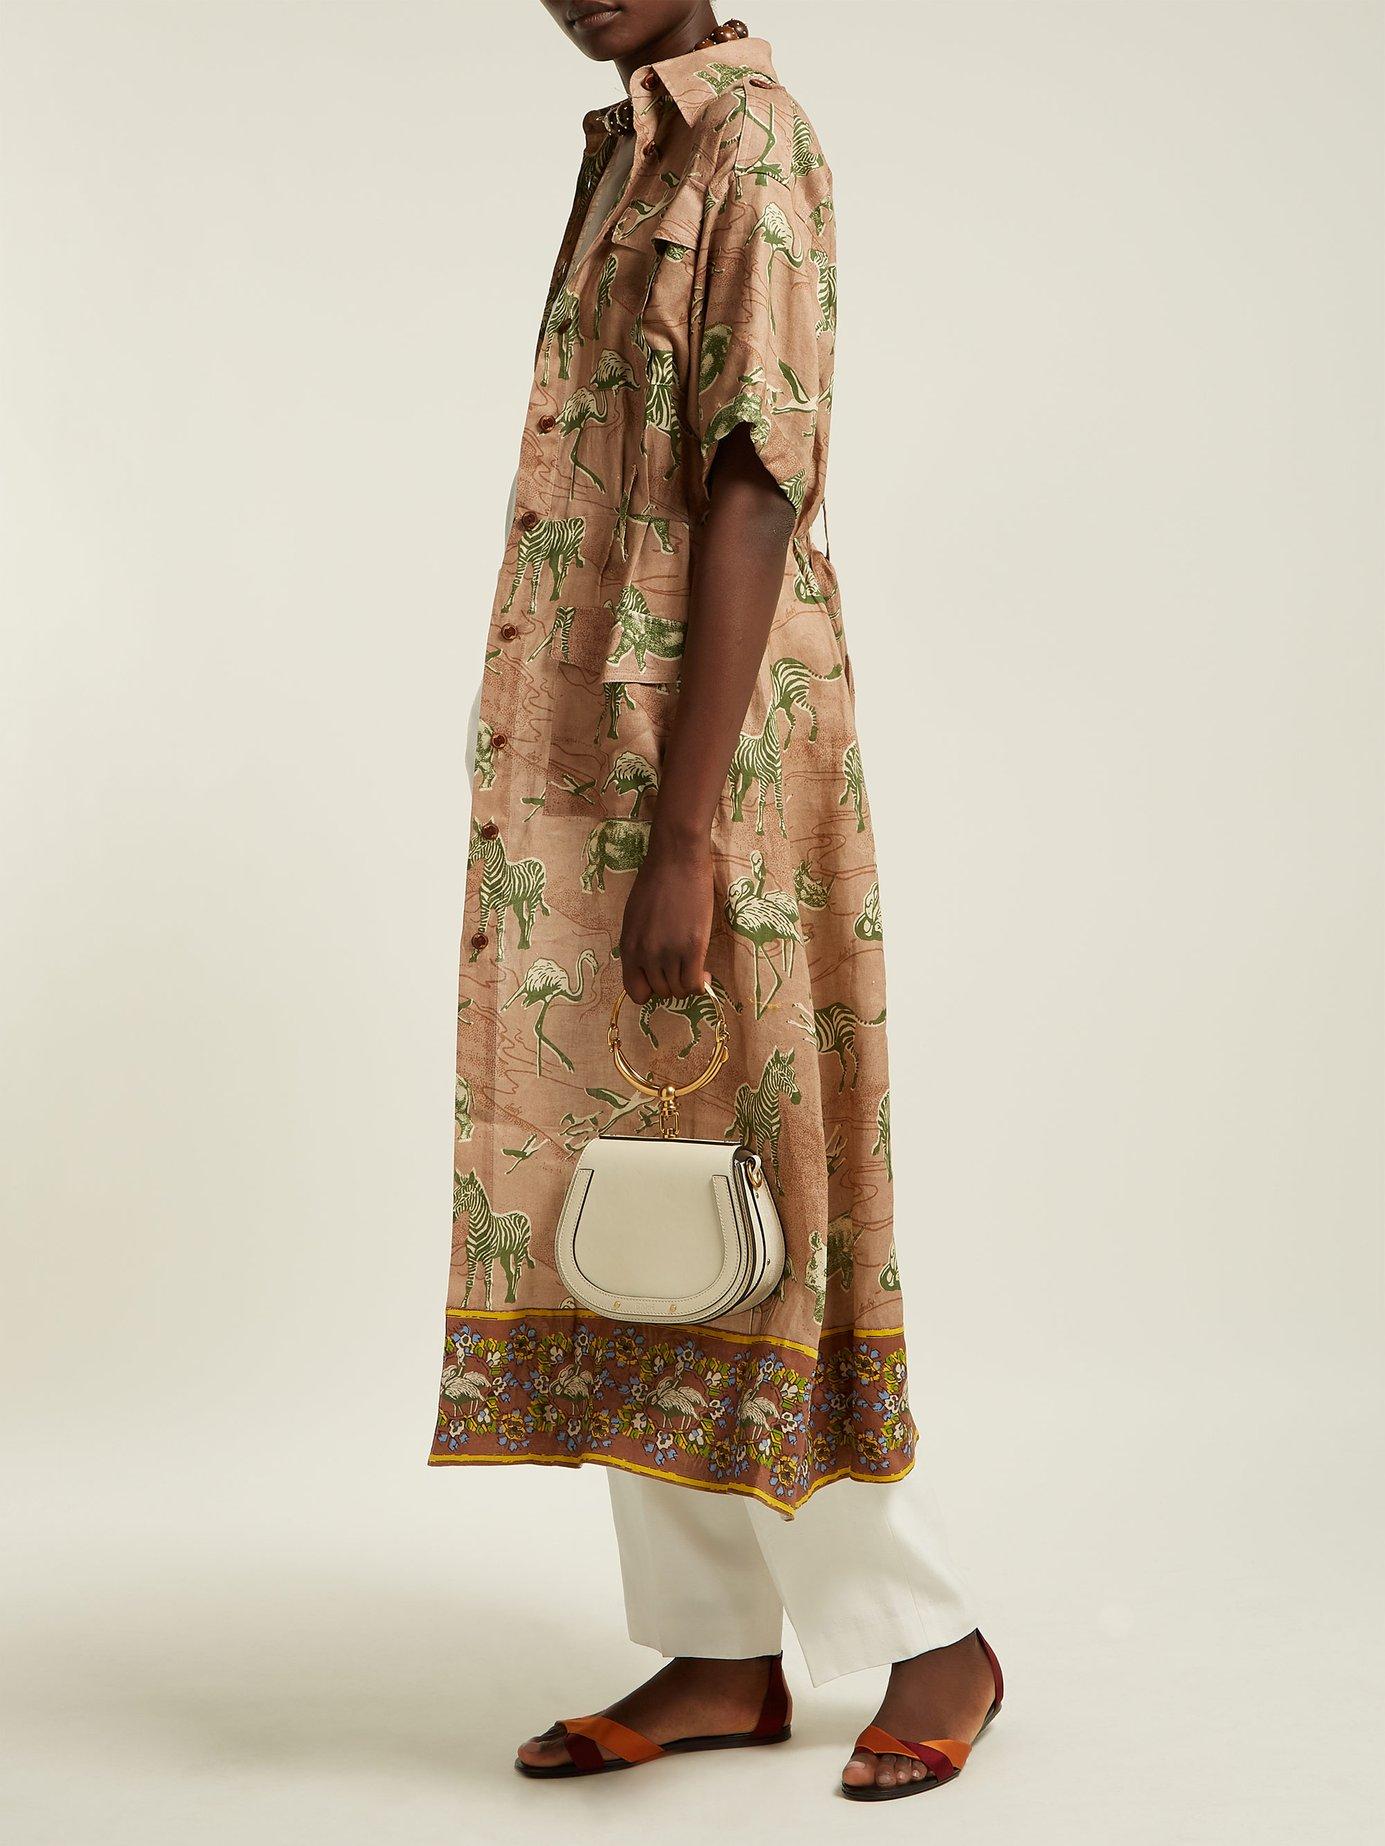 Kinyei safari-print linen shirt dress by Chufy